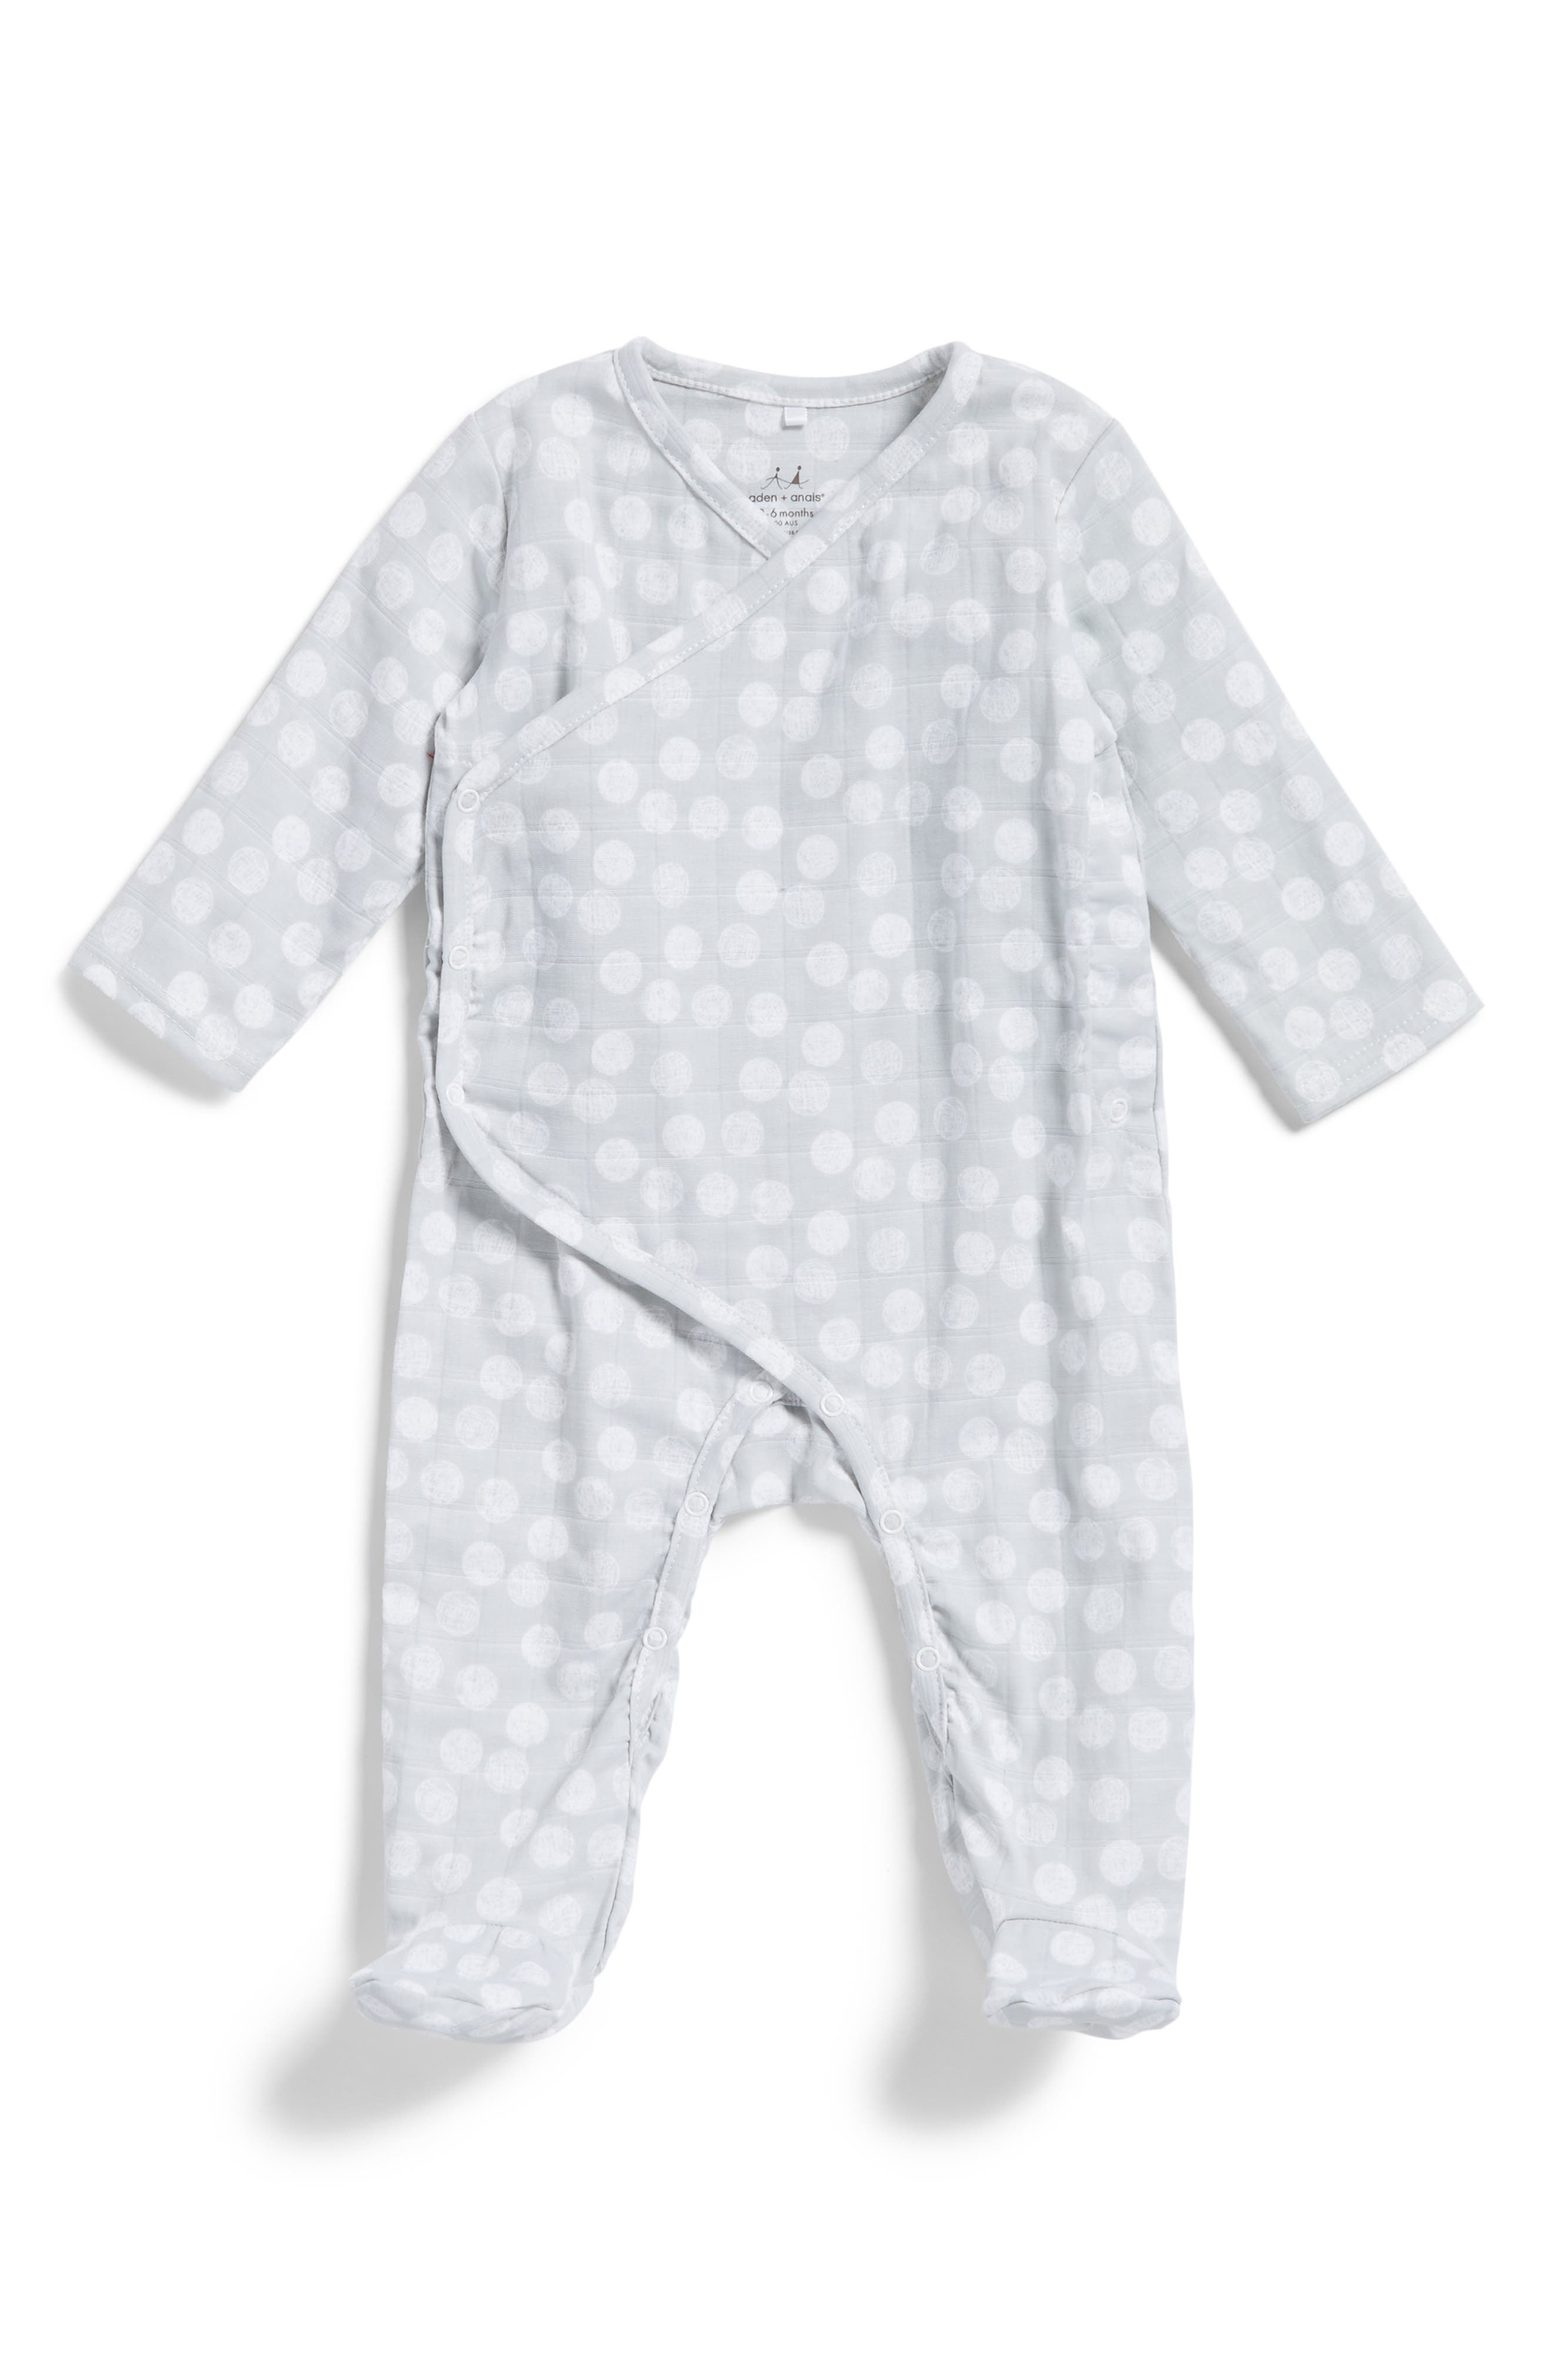 Main Image - aden + anais Kimono One-Piece (Baby)